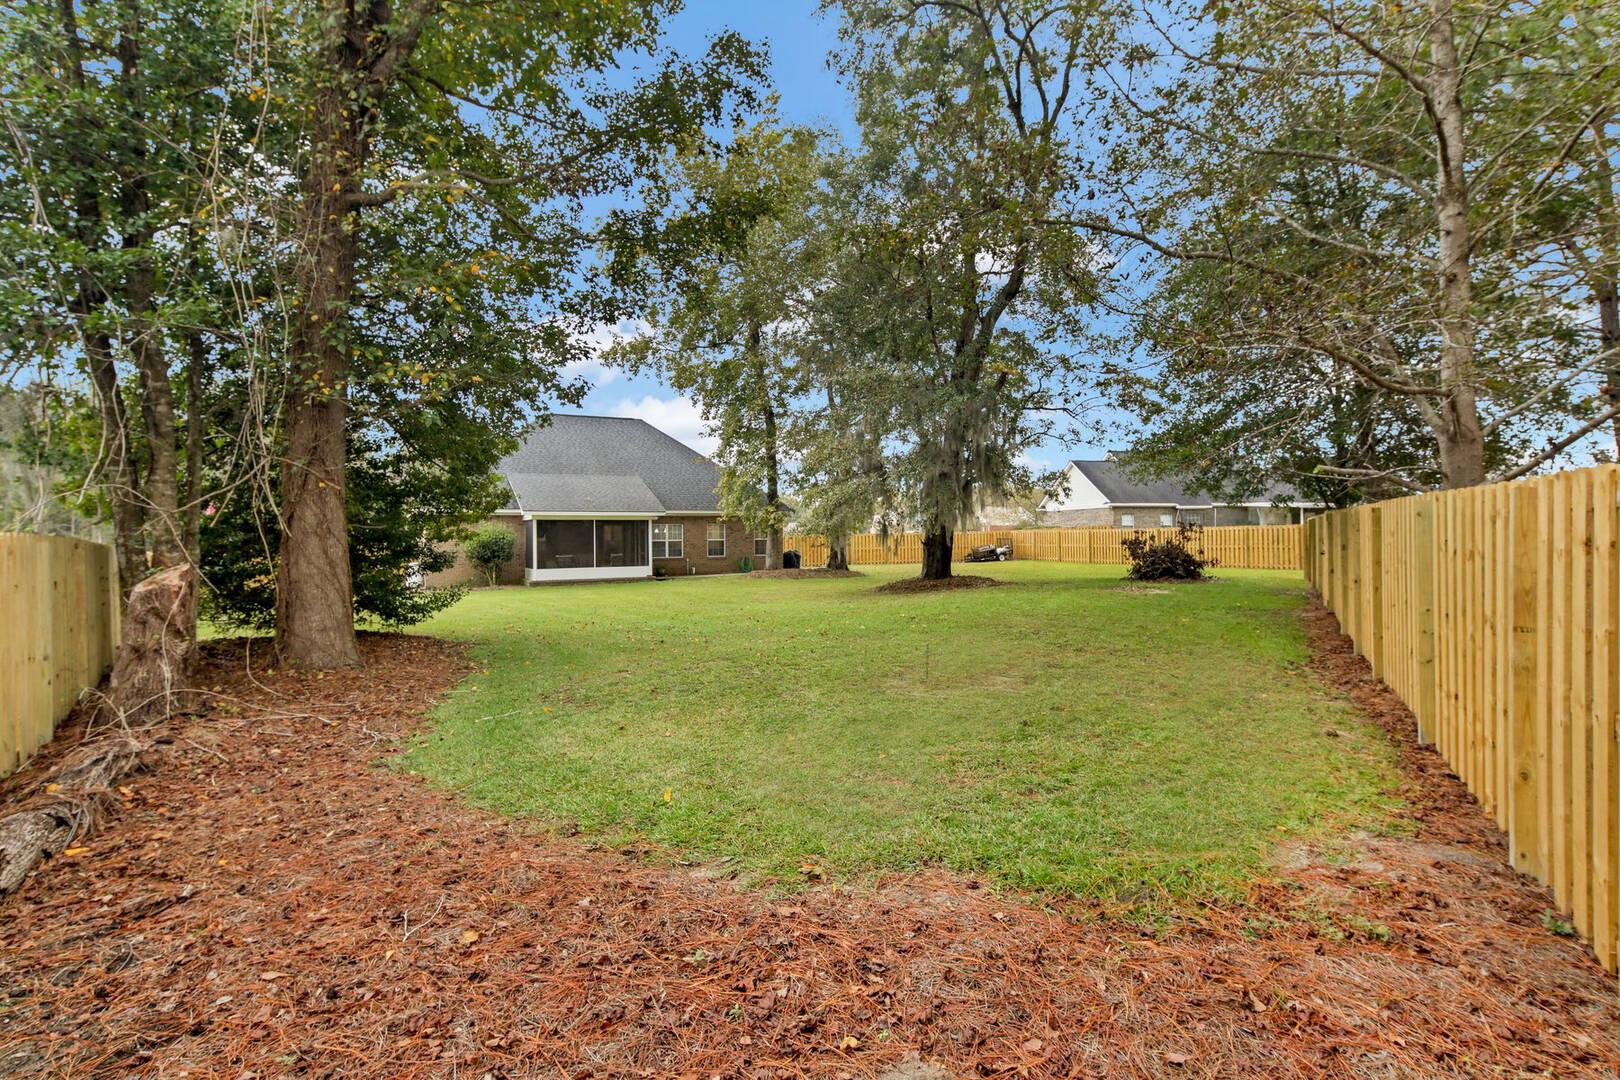 120 Jamestown Drive Rincon, GA 31326 Rincon, GA 31326